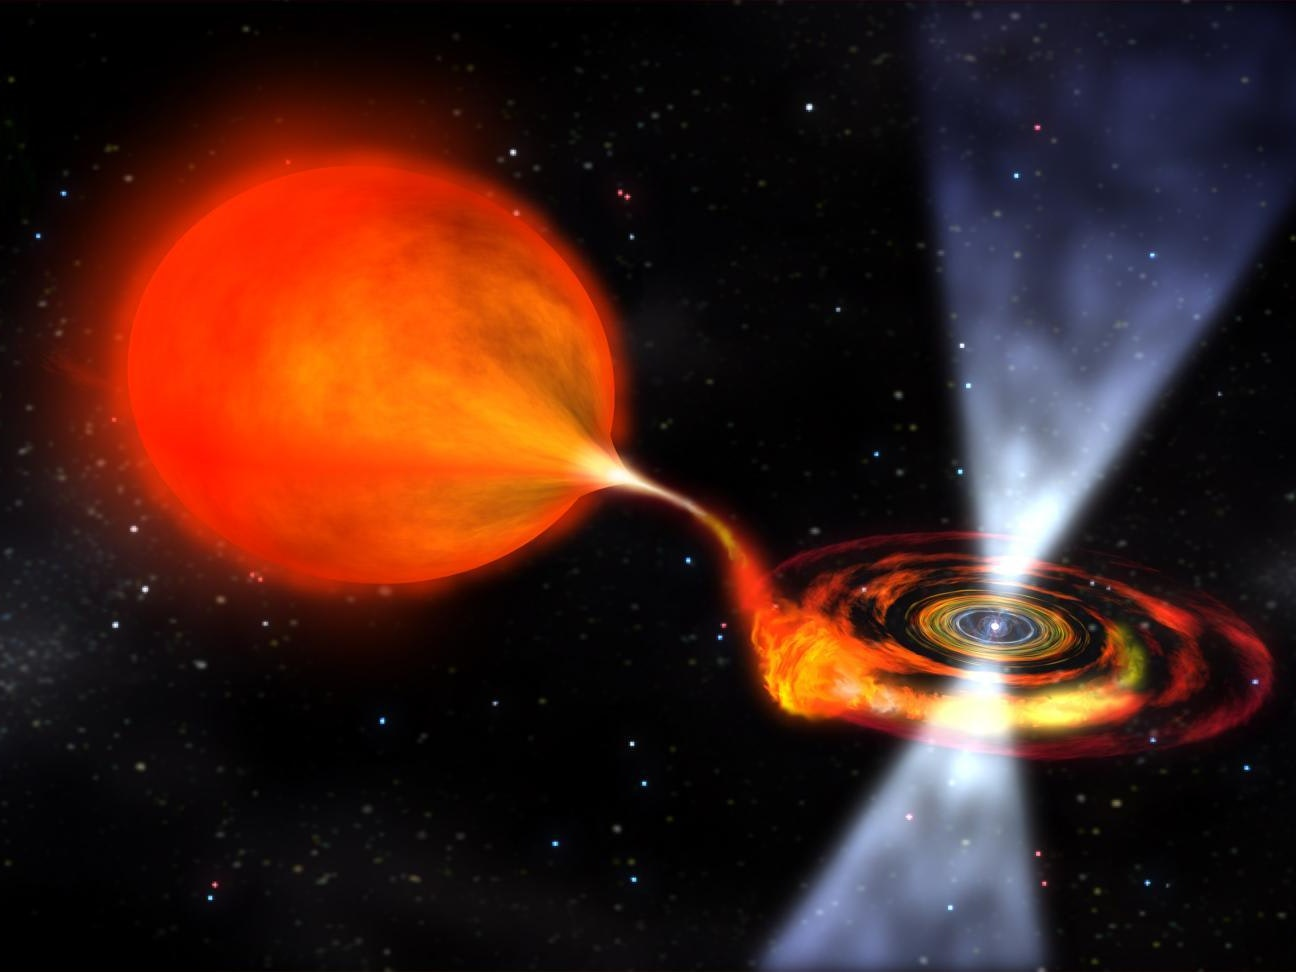 Artist's rendering of a pulsar binary system.